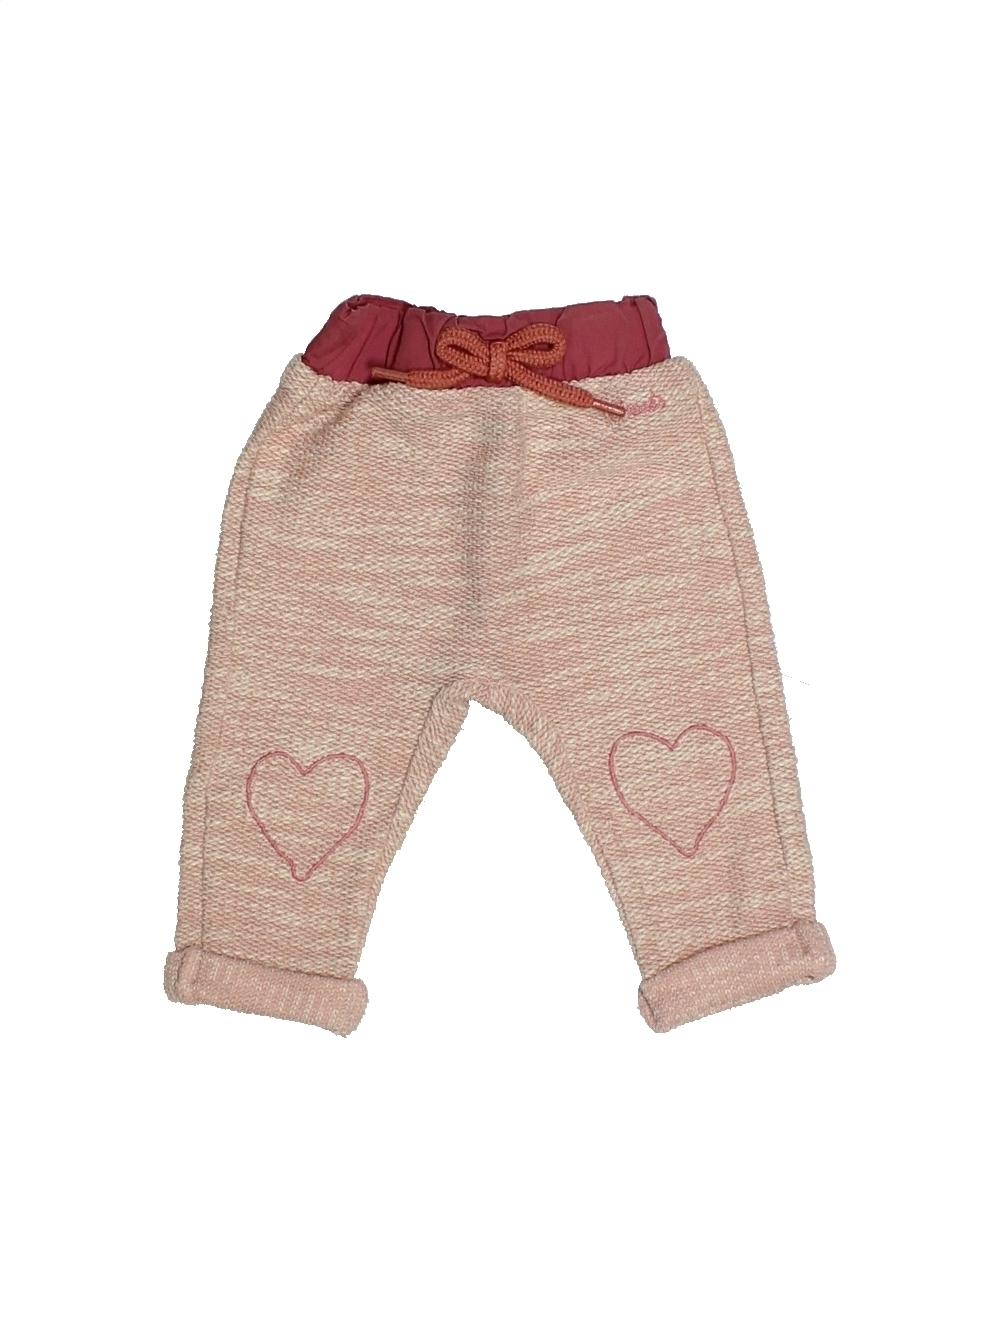 Pantalon-bebe-fille-CREEKS-3-mois-beige-hiver-vetement-bebe-1132142